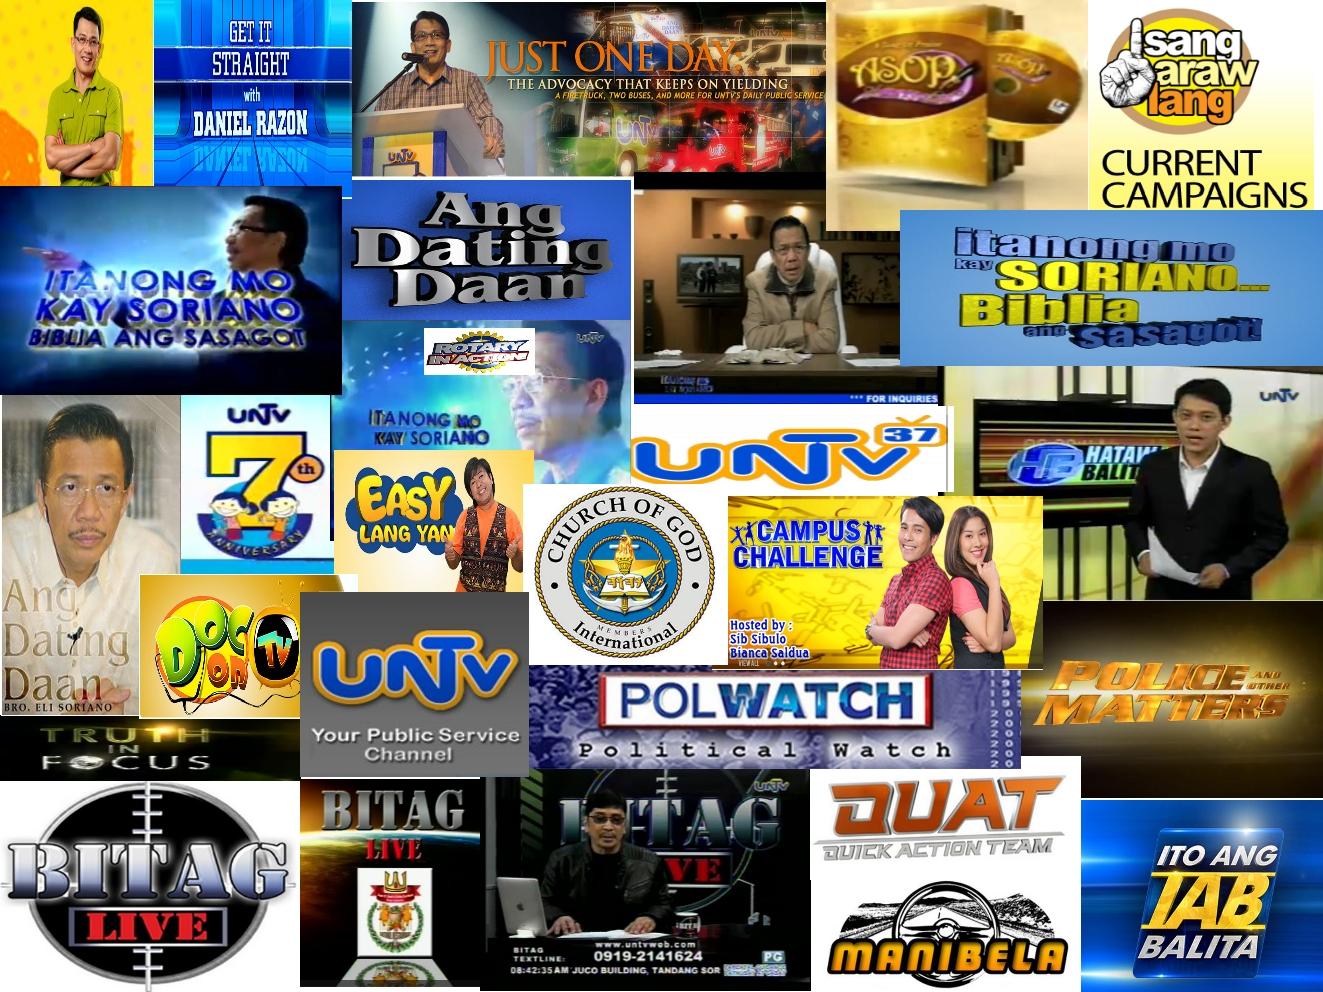 Untv 37 and dating daan philippines